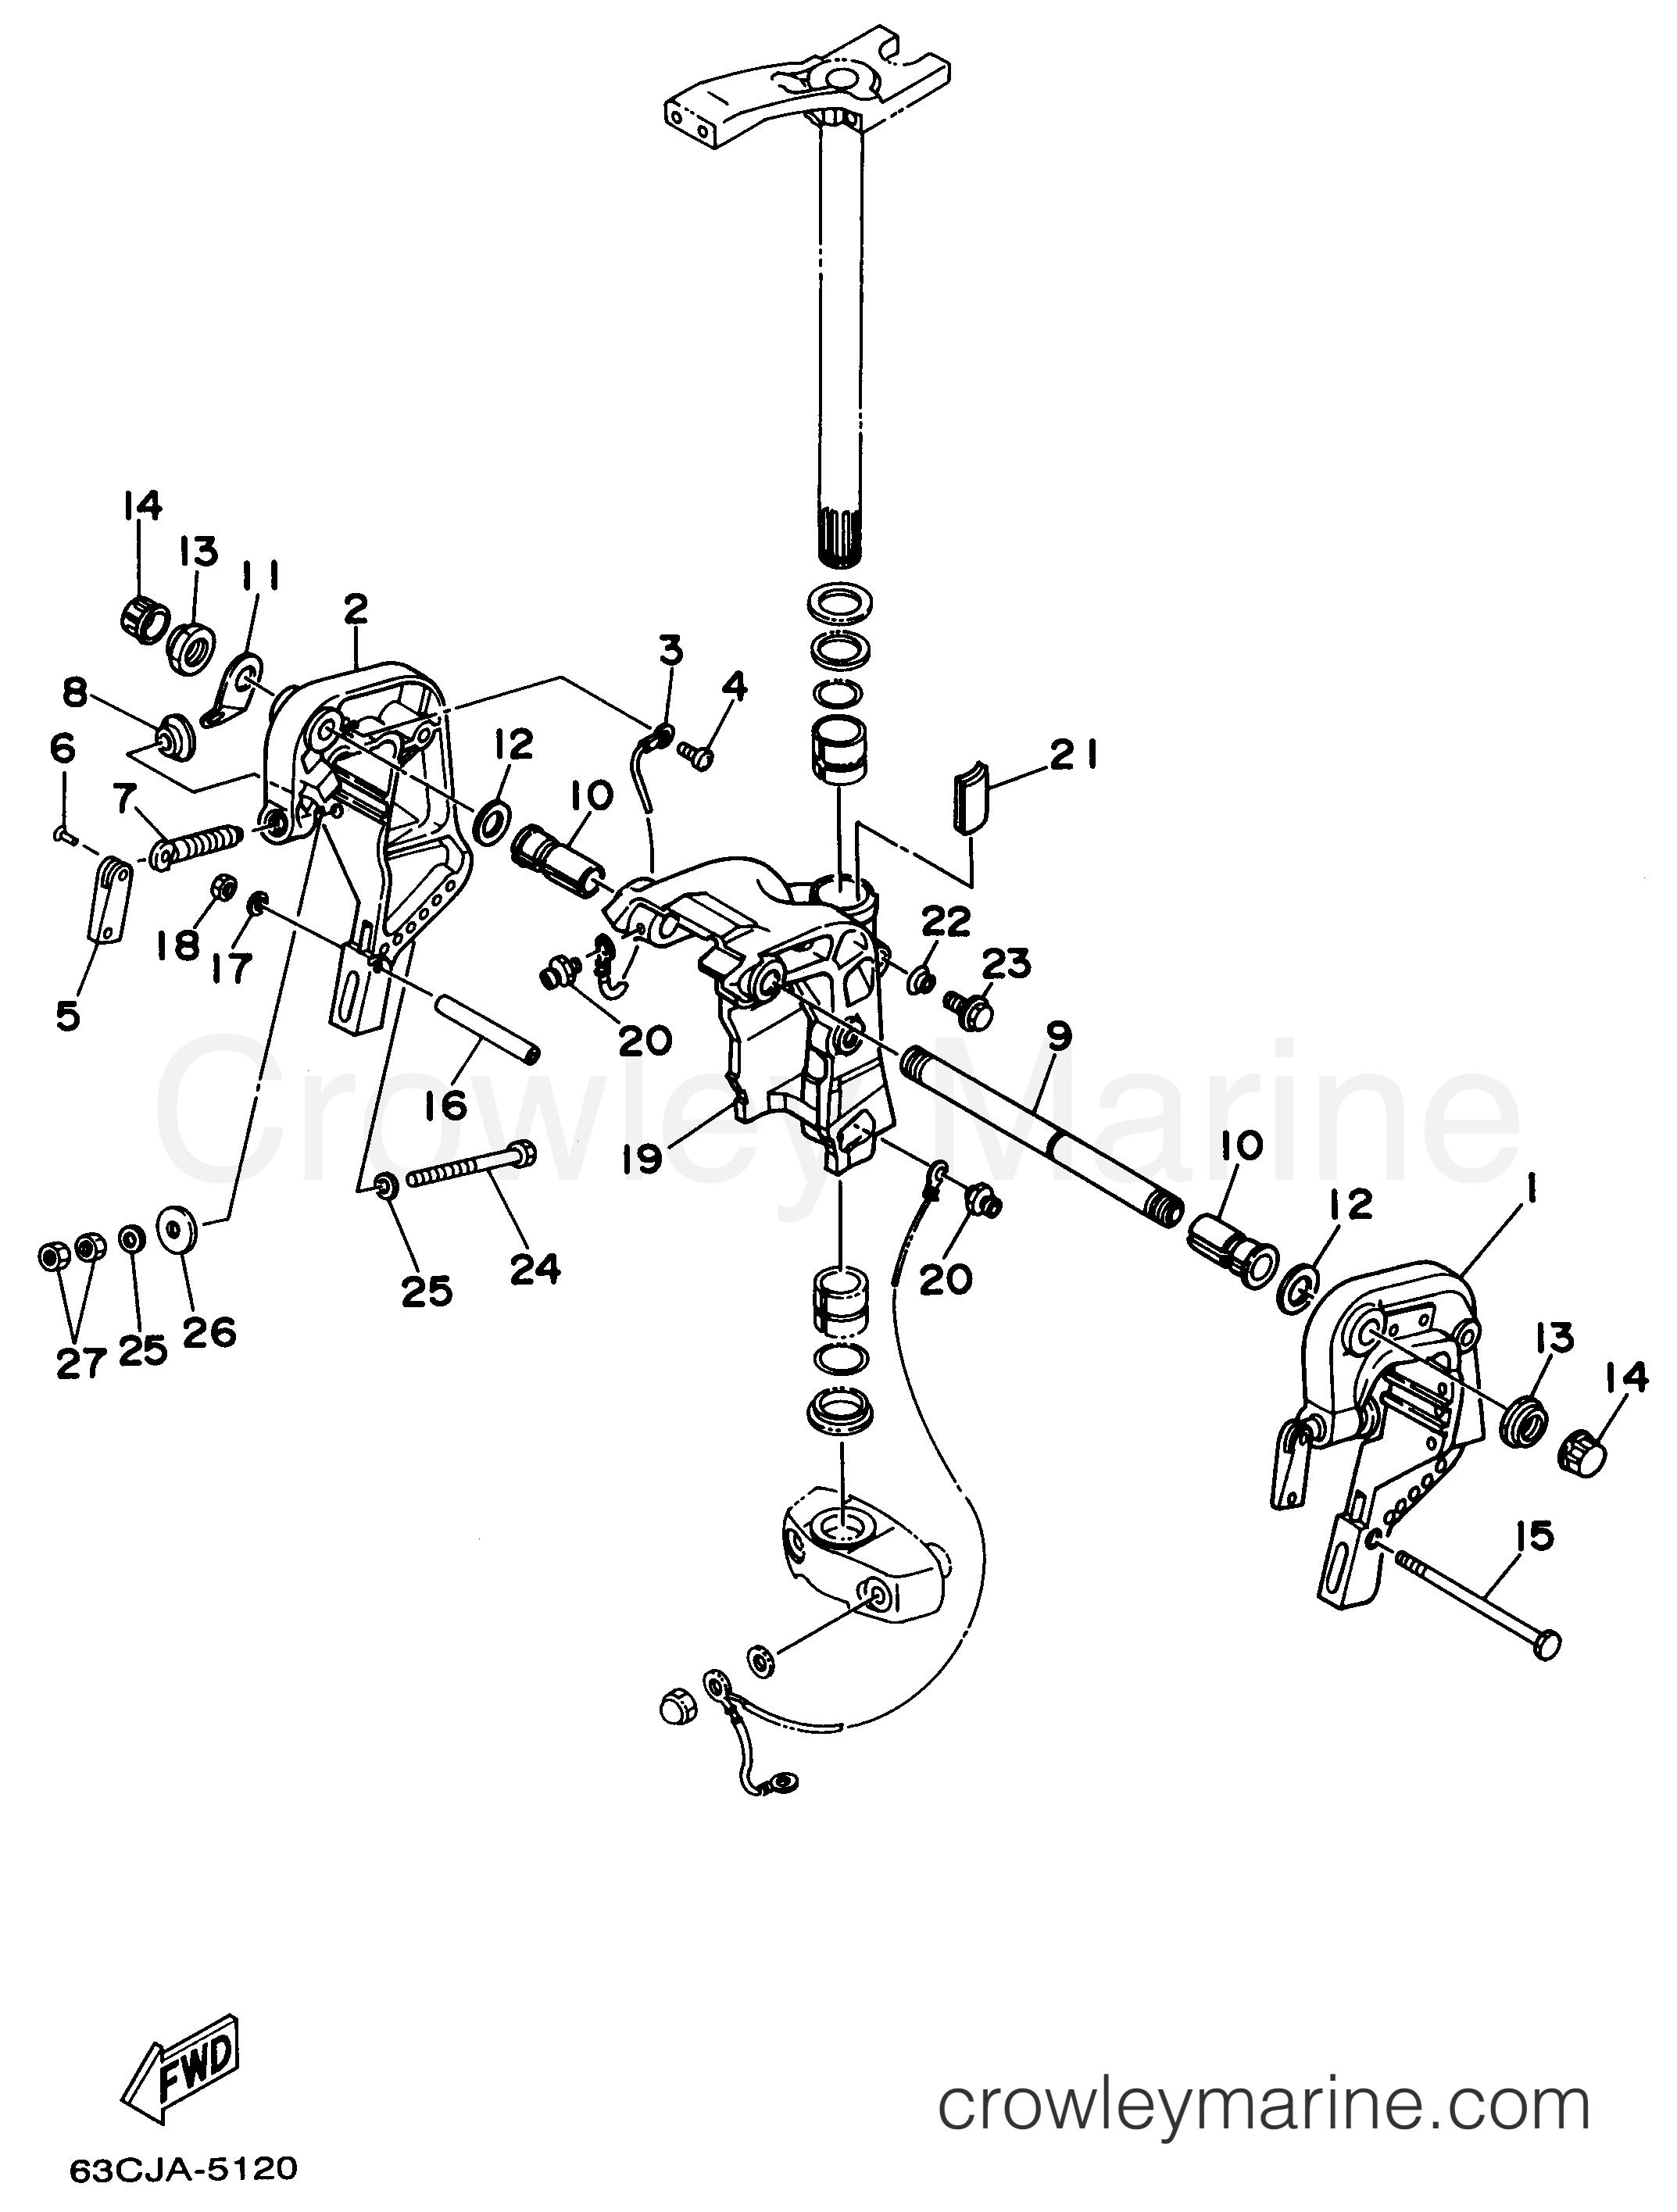 Bracket 2 Manual Tilt